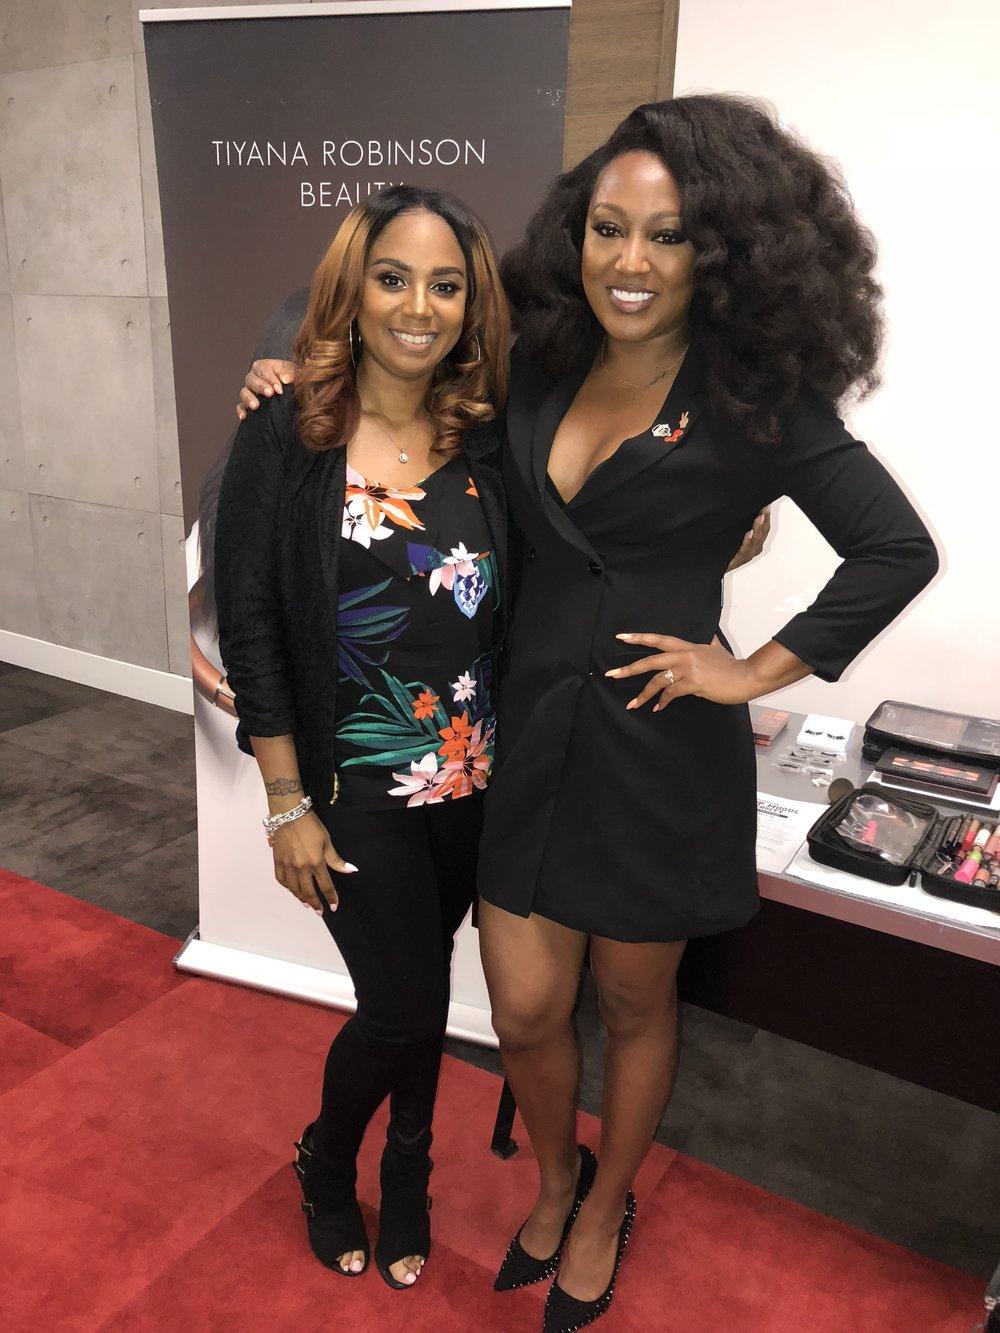 An investment well spent. Jennifer J. with Tiyana Robinson.